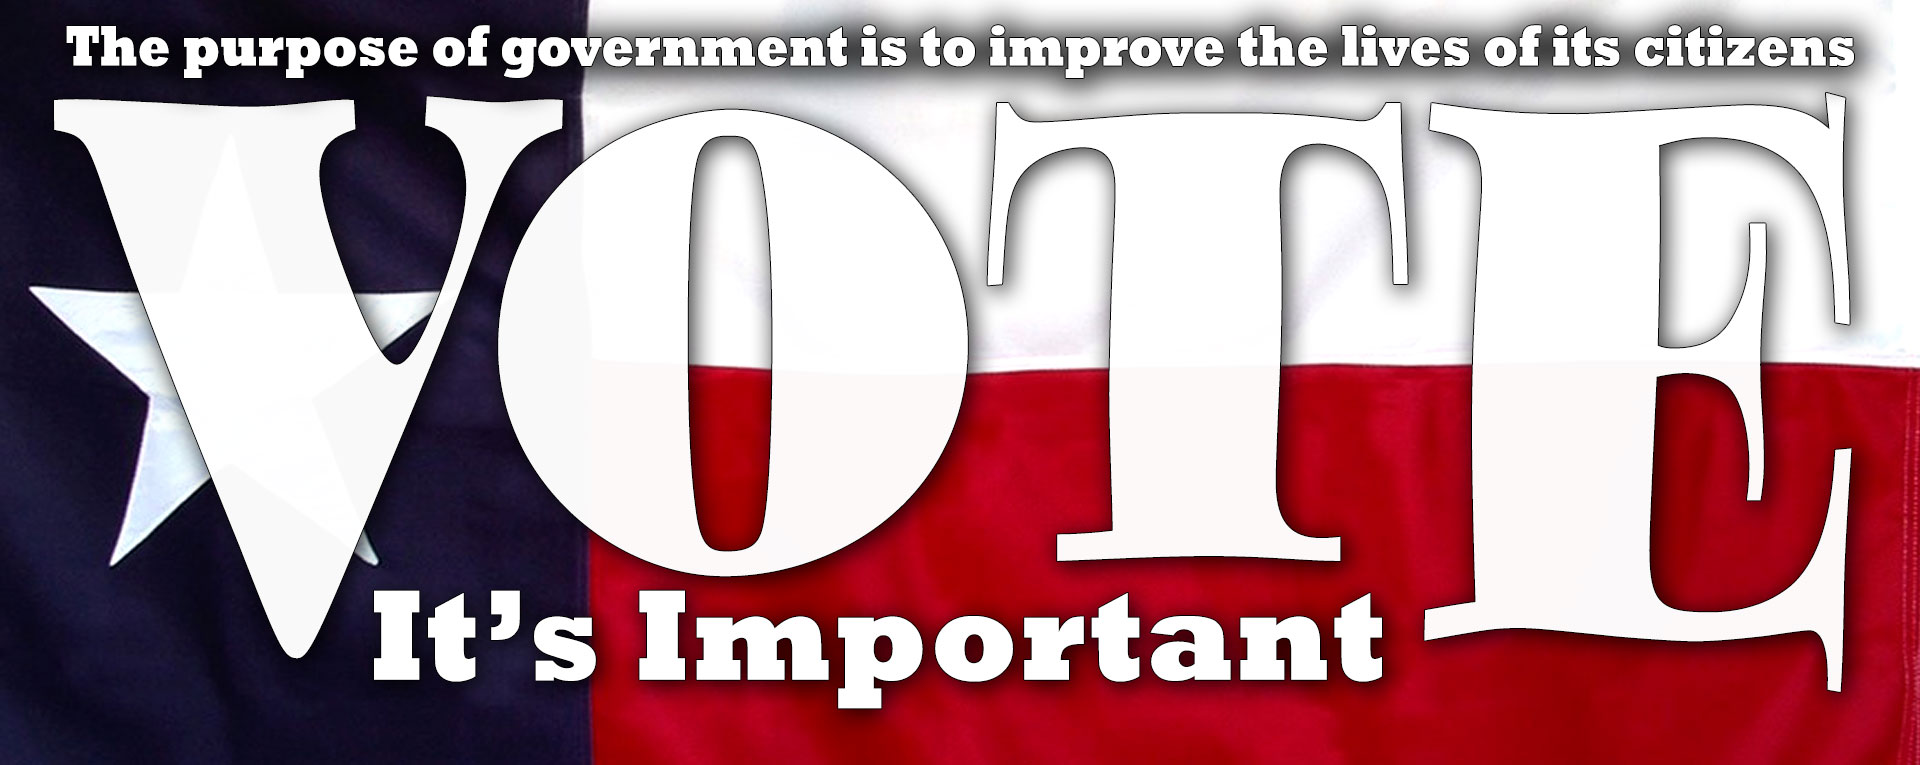 vote_its_importan_TXt